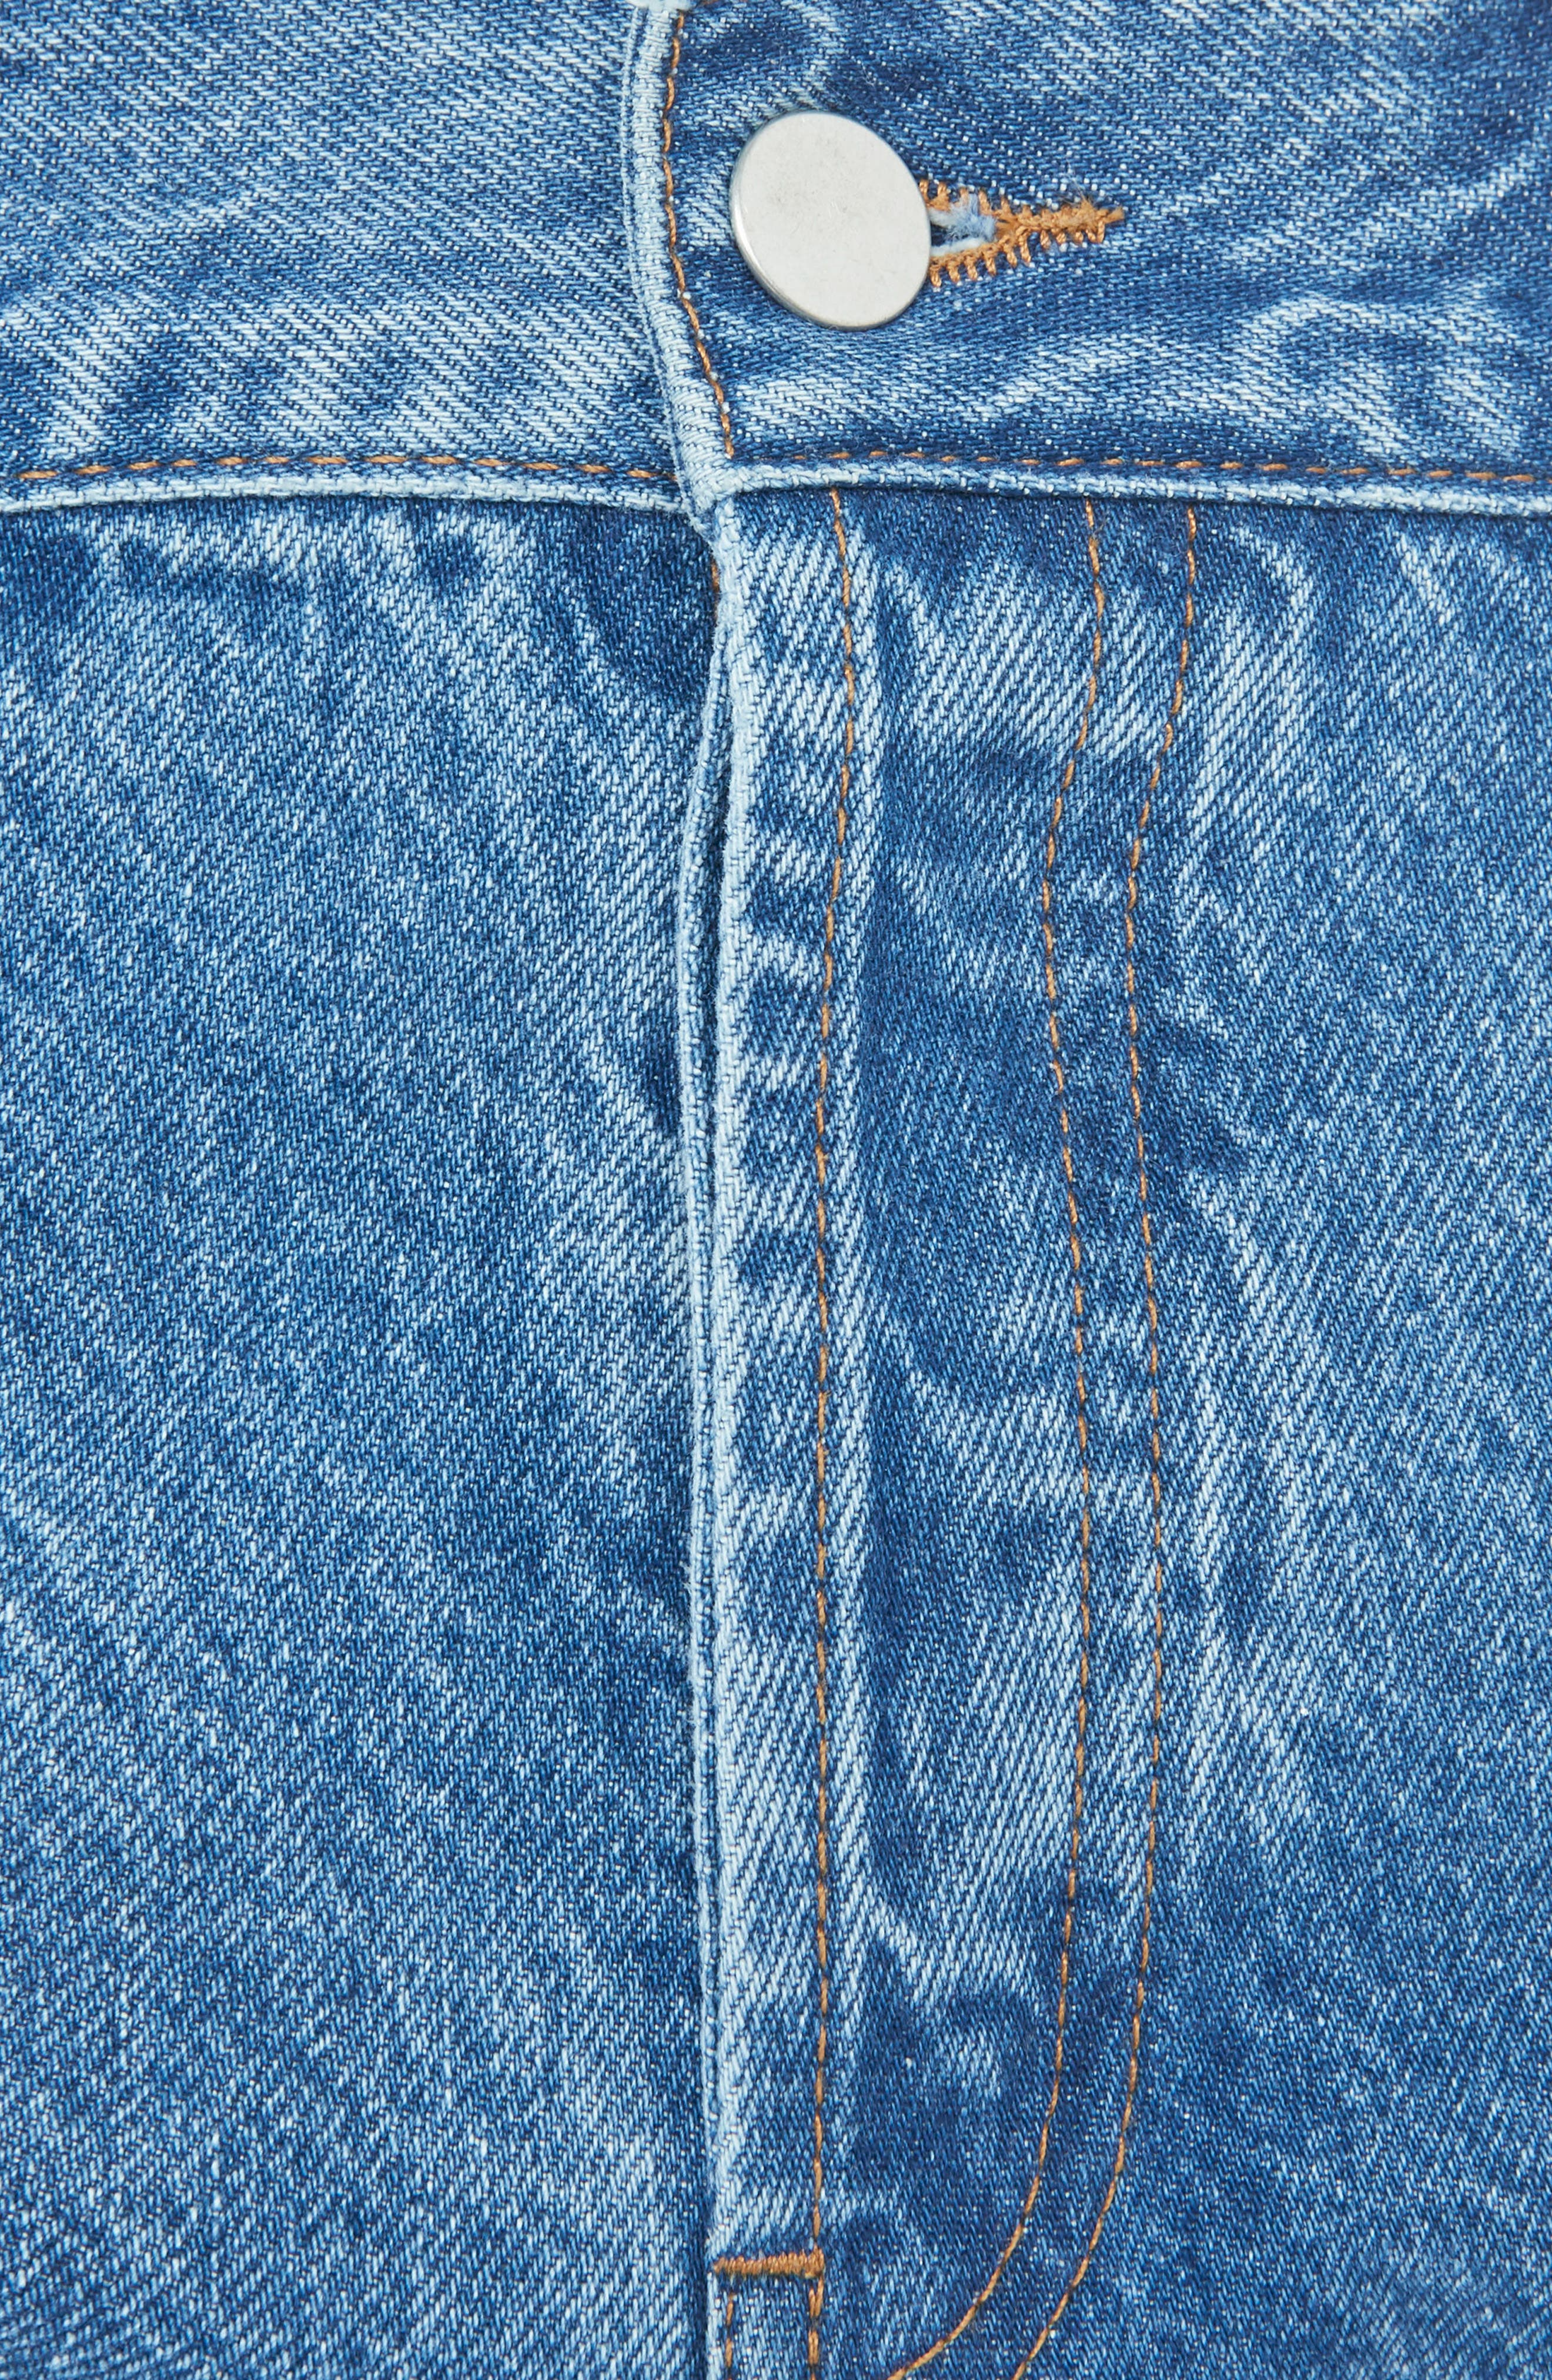 Medium Wash Straight Leg Jeans,                             Main thumbnail 1, color,                             401